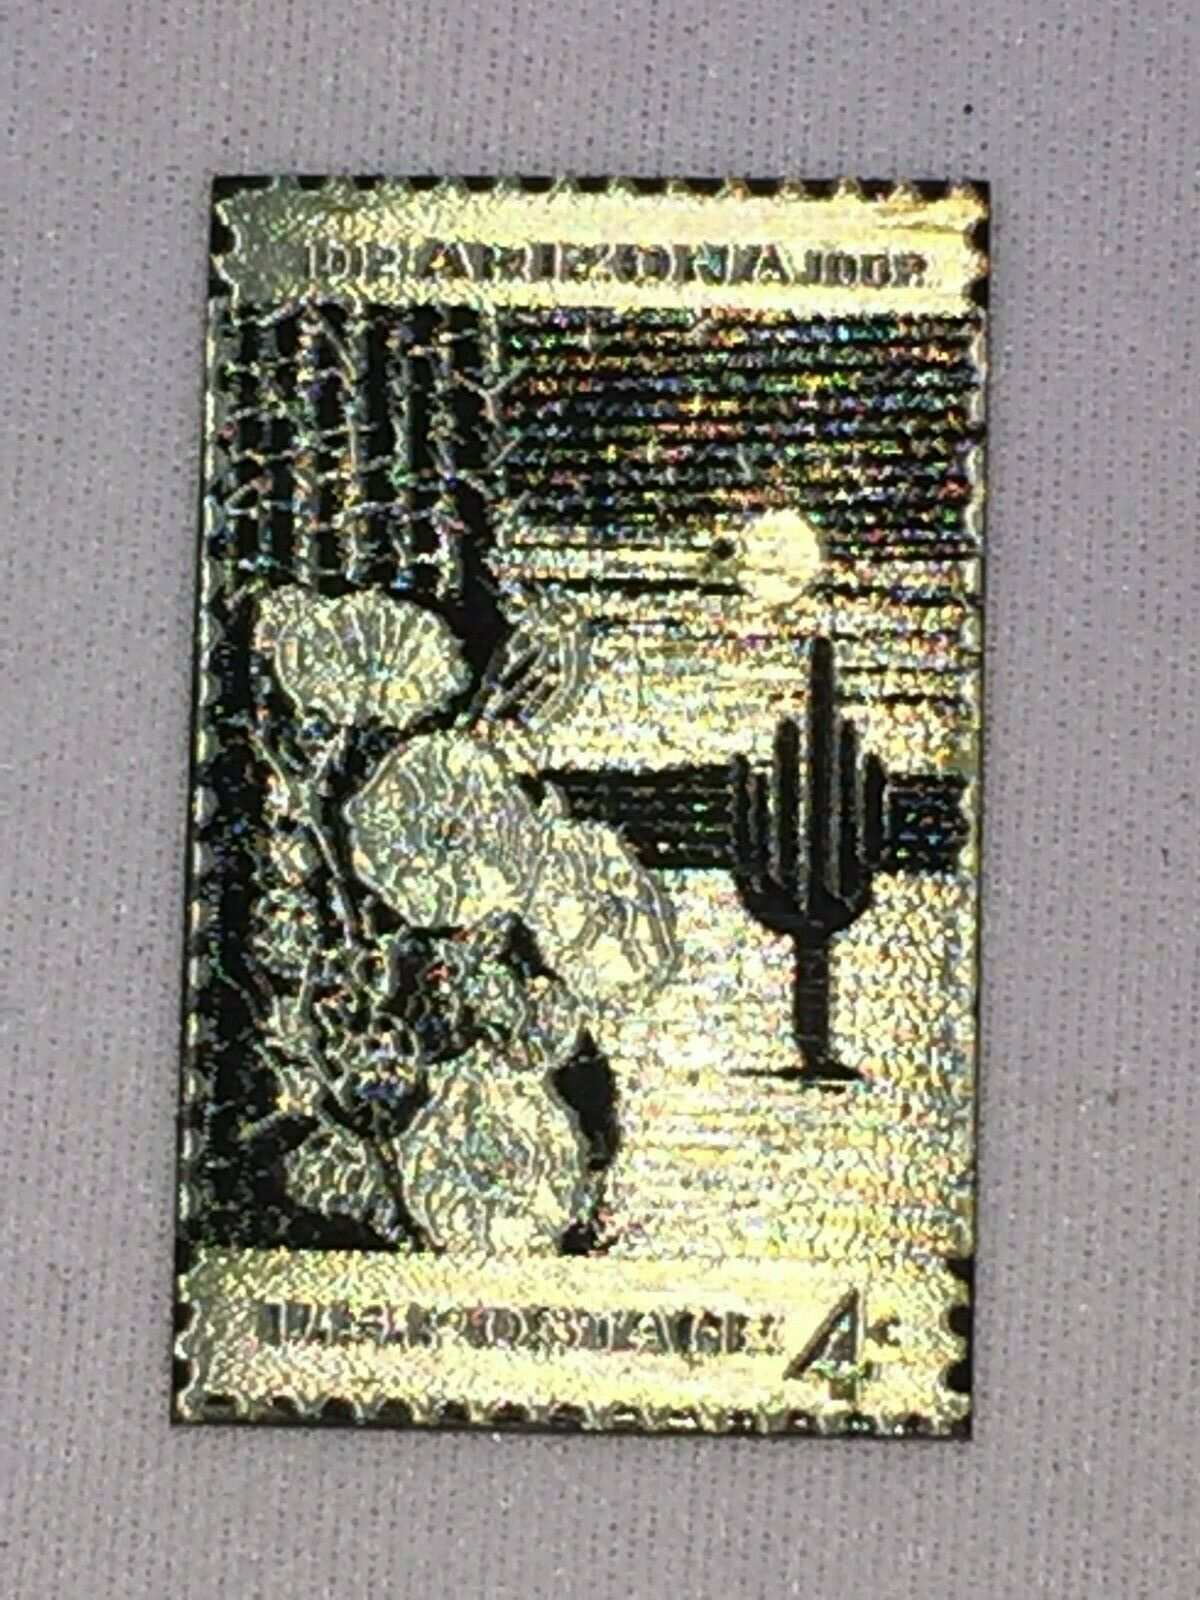 Arizona State Metal Stamp posta Ignette 26554 Postal USPS